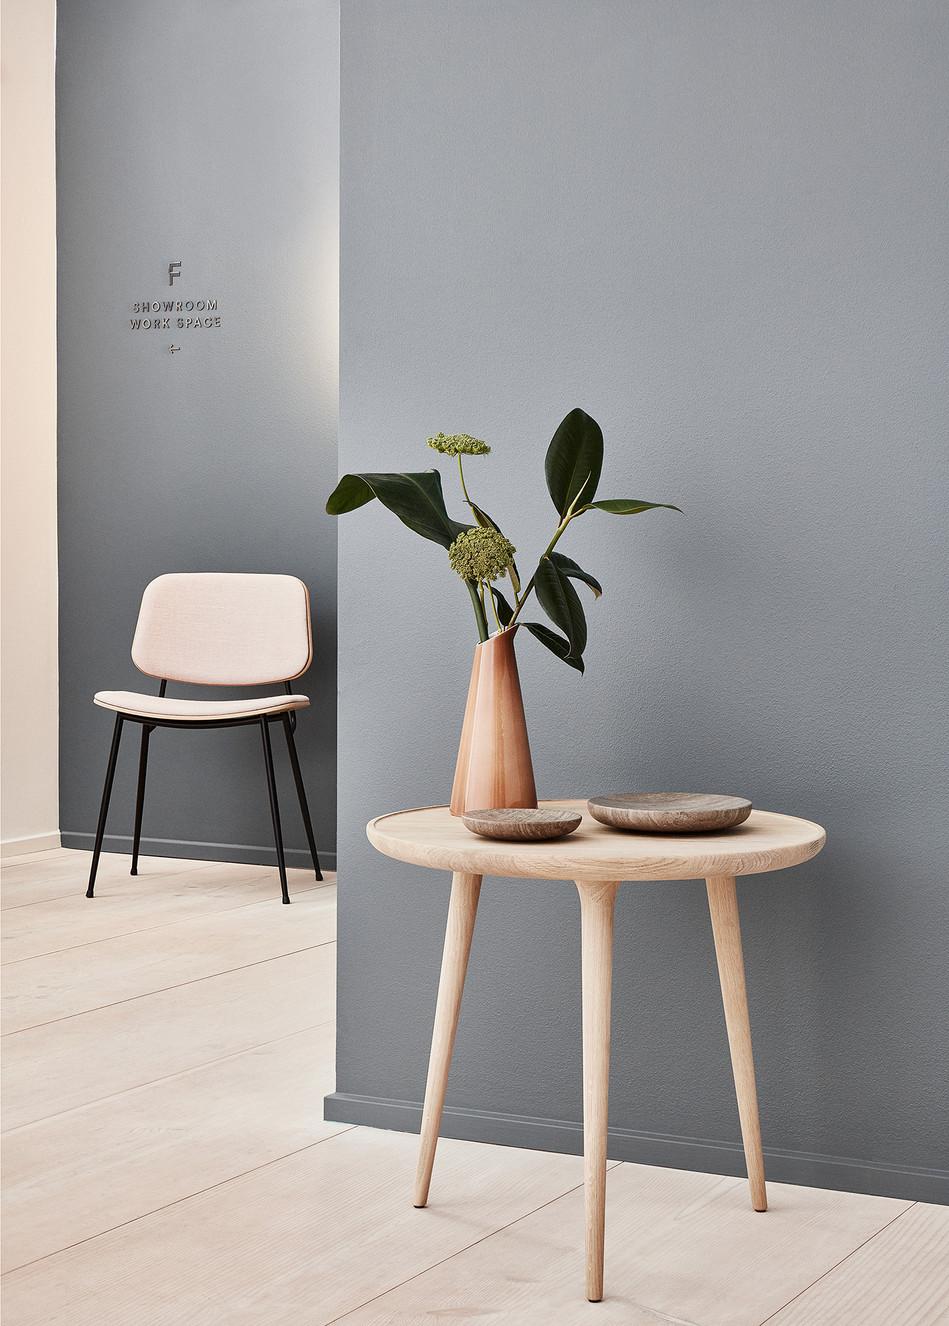 Bo Bedre Fredericia Furniture